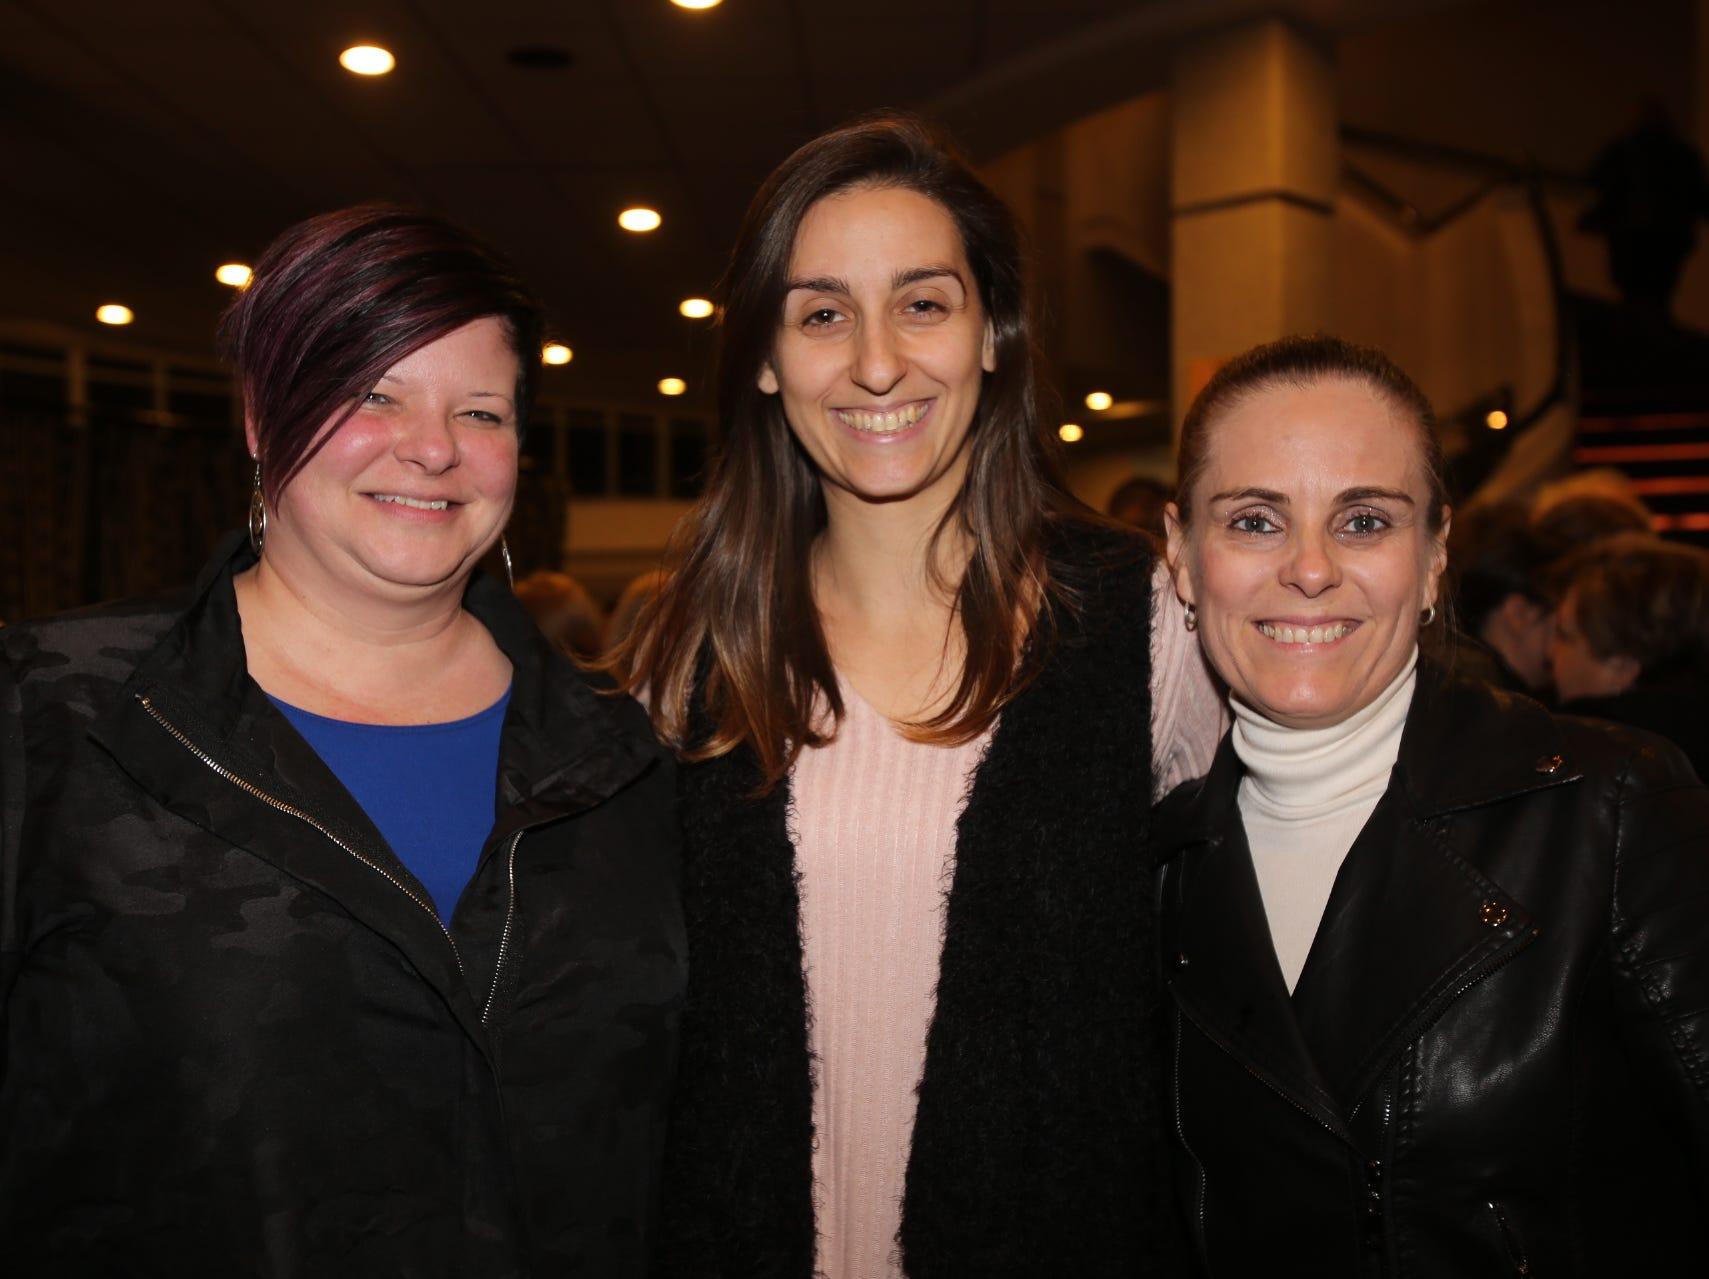 Shannon Derricks, Karen Rivatto, and Lisi Matsdorff